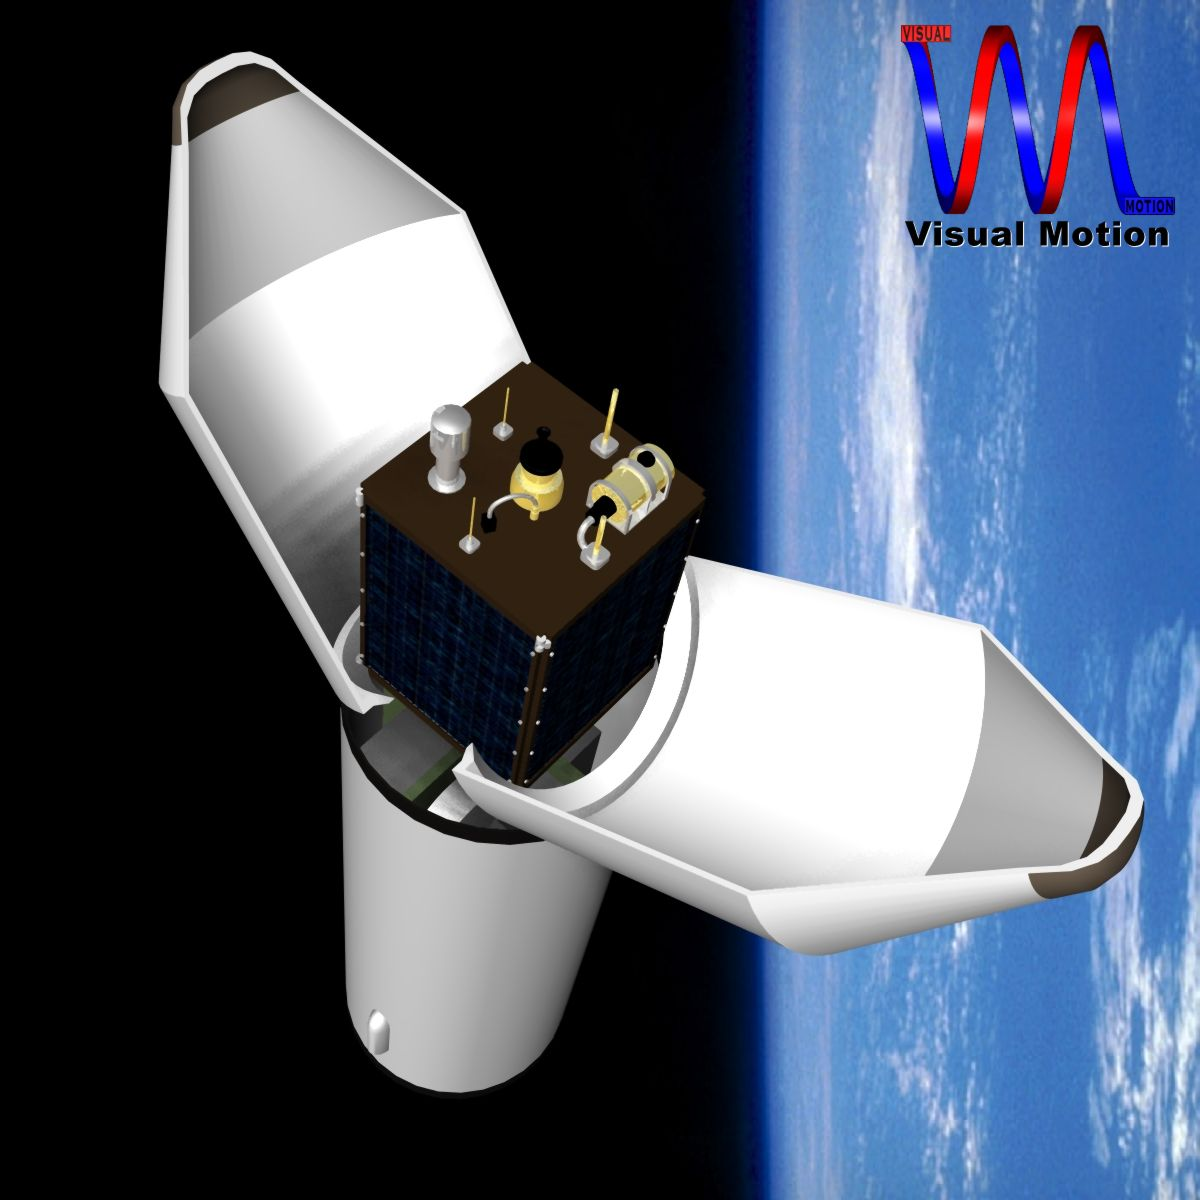 dprk kwangmyongsong-3 satellite 3d model 3ds dxf cob x obj 134454